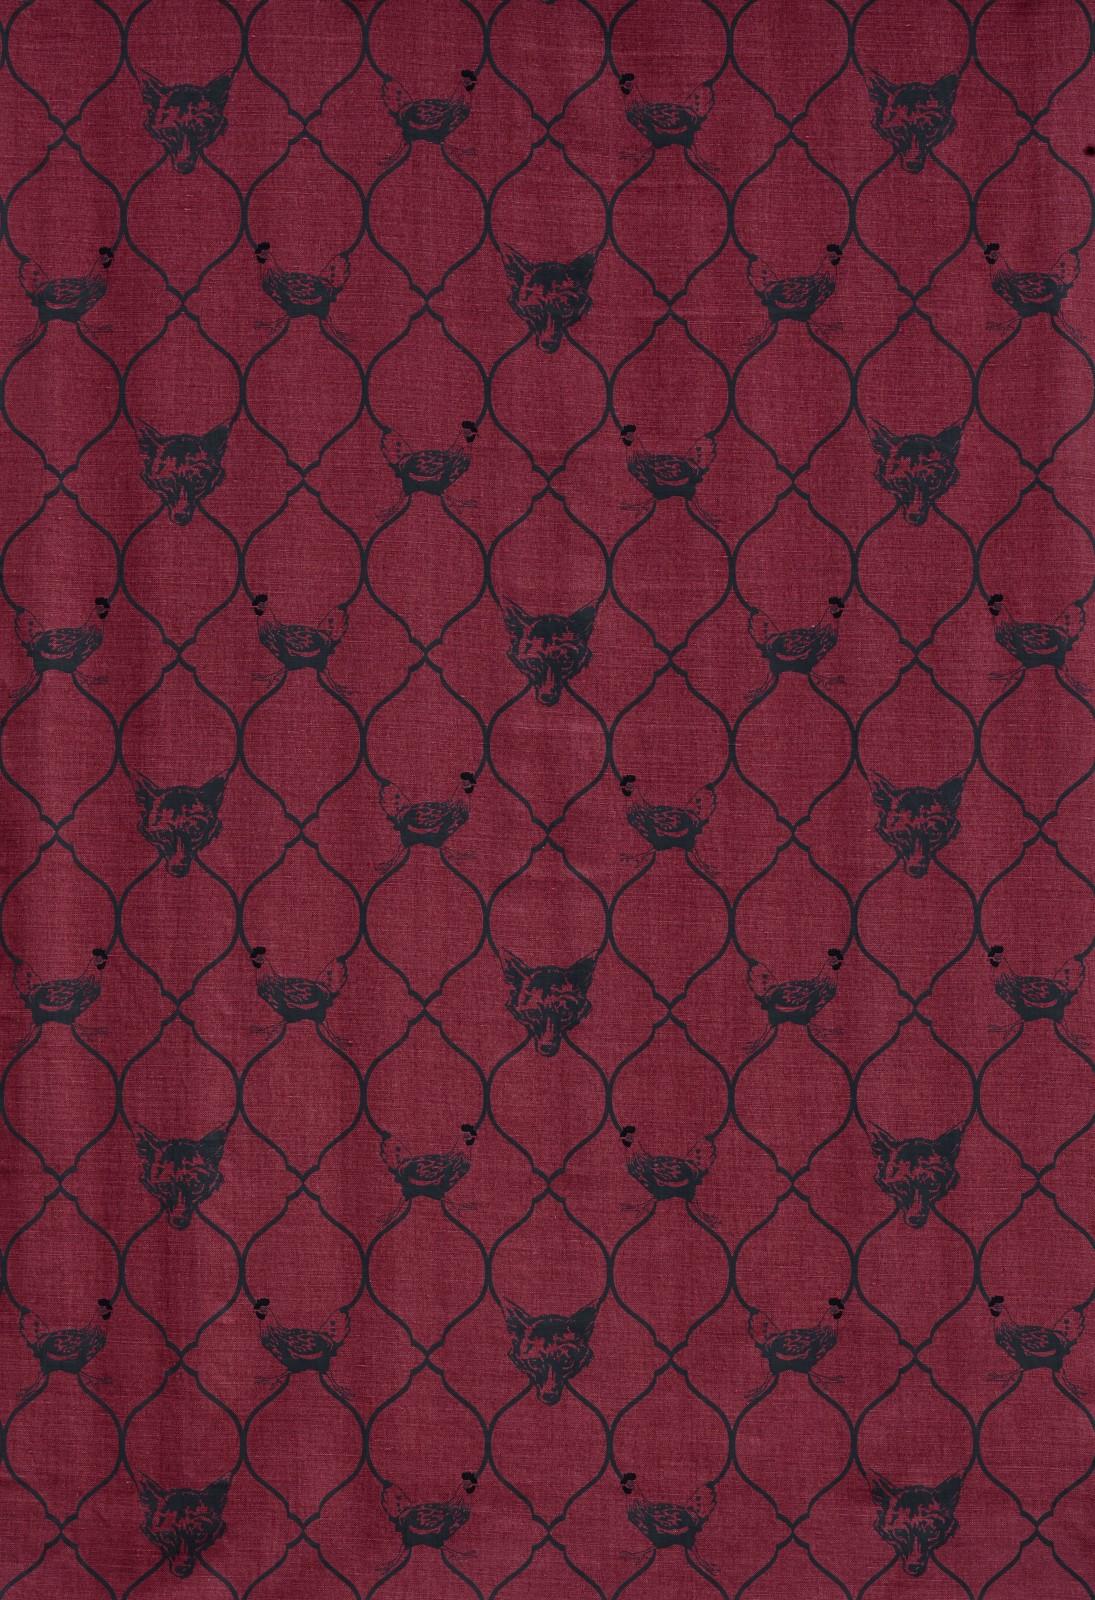 Fox & Hen Fabric Brick